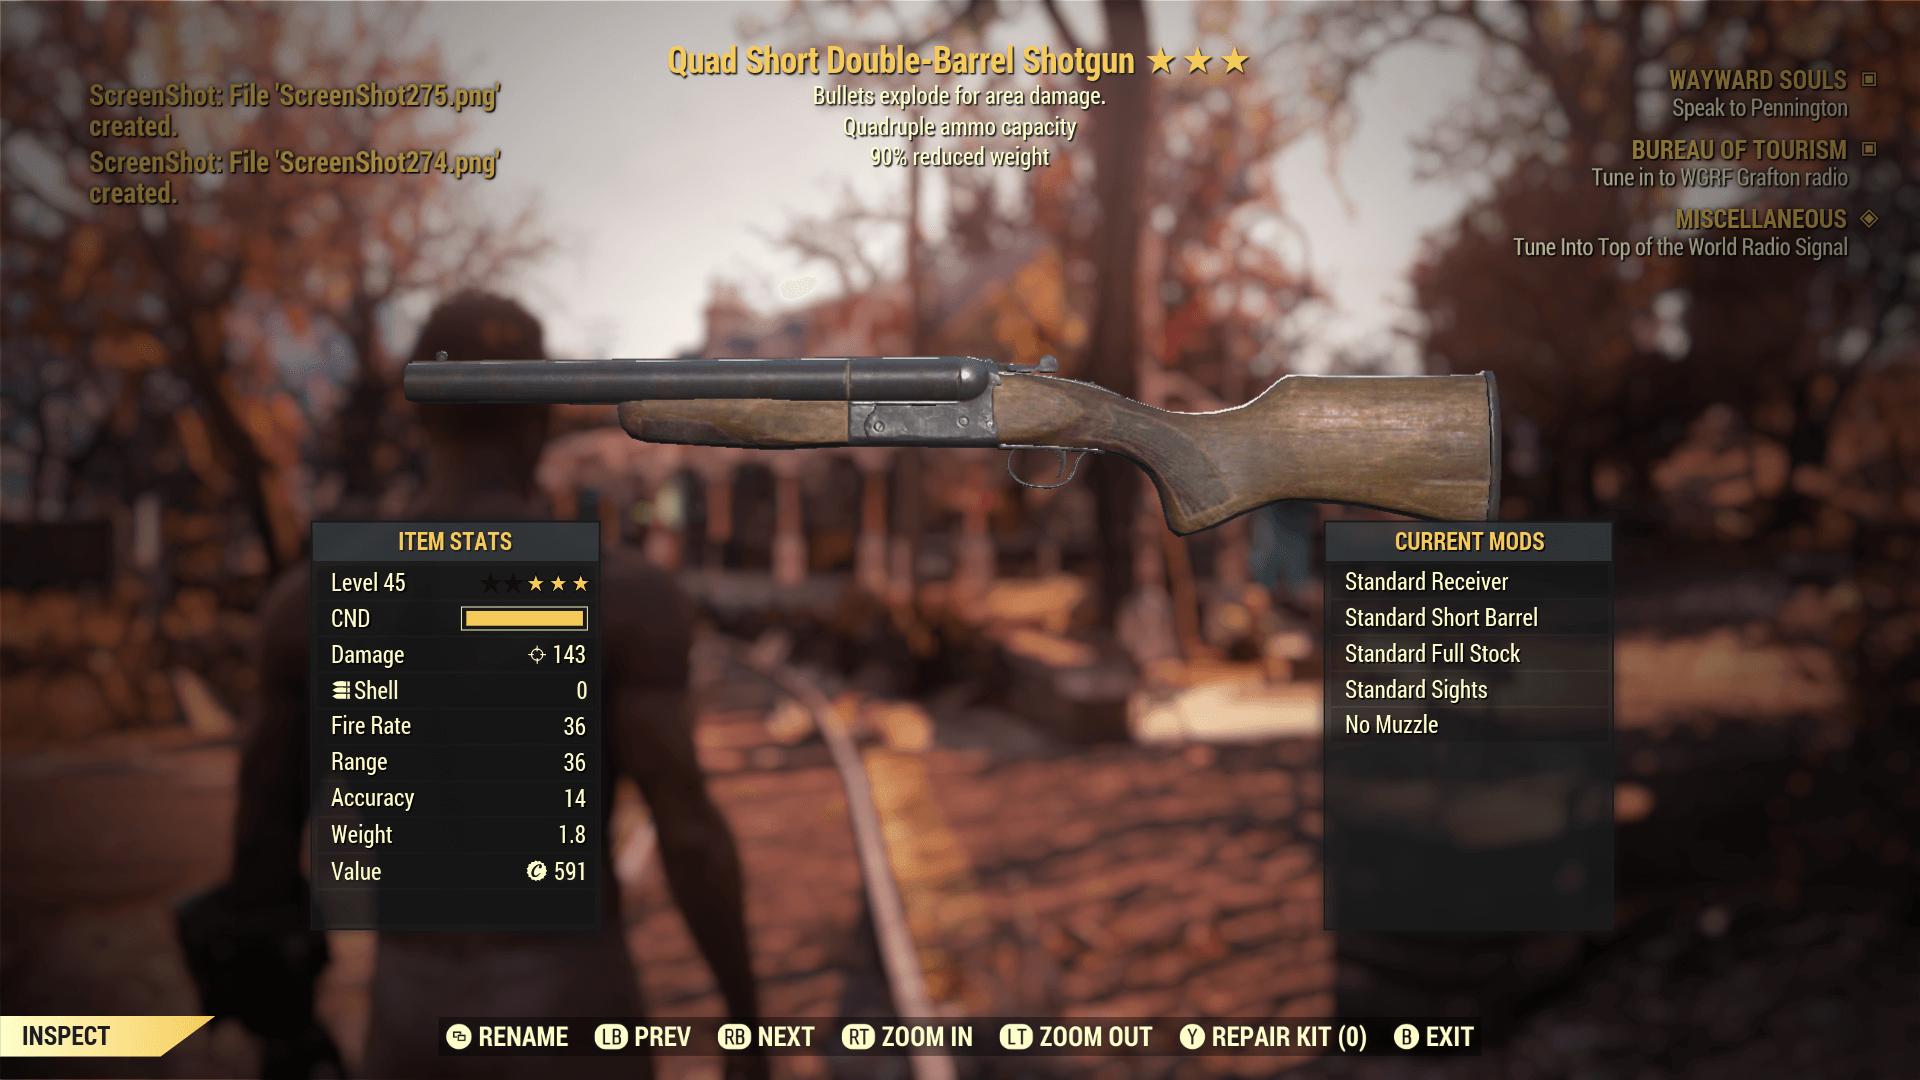 Quad Short Double-Barrel Shotgun[90% reduced weight]